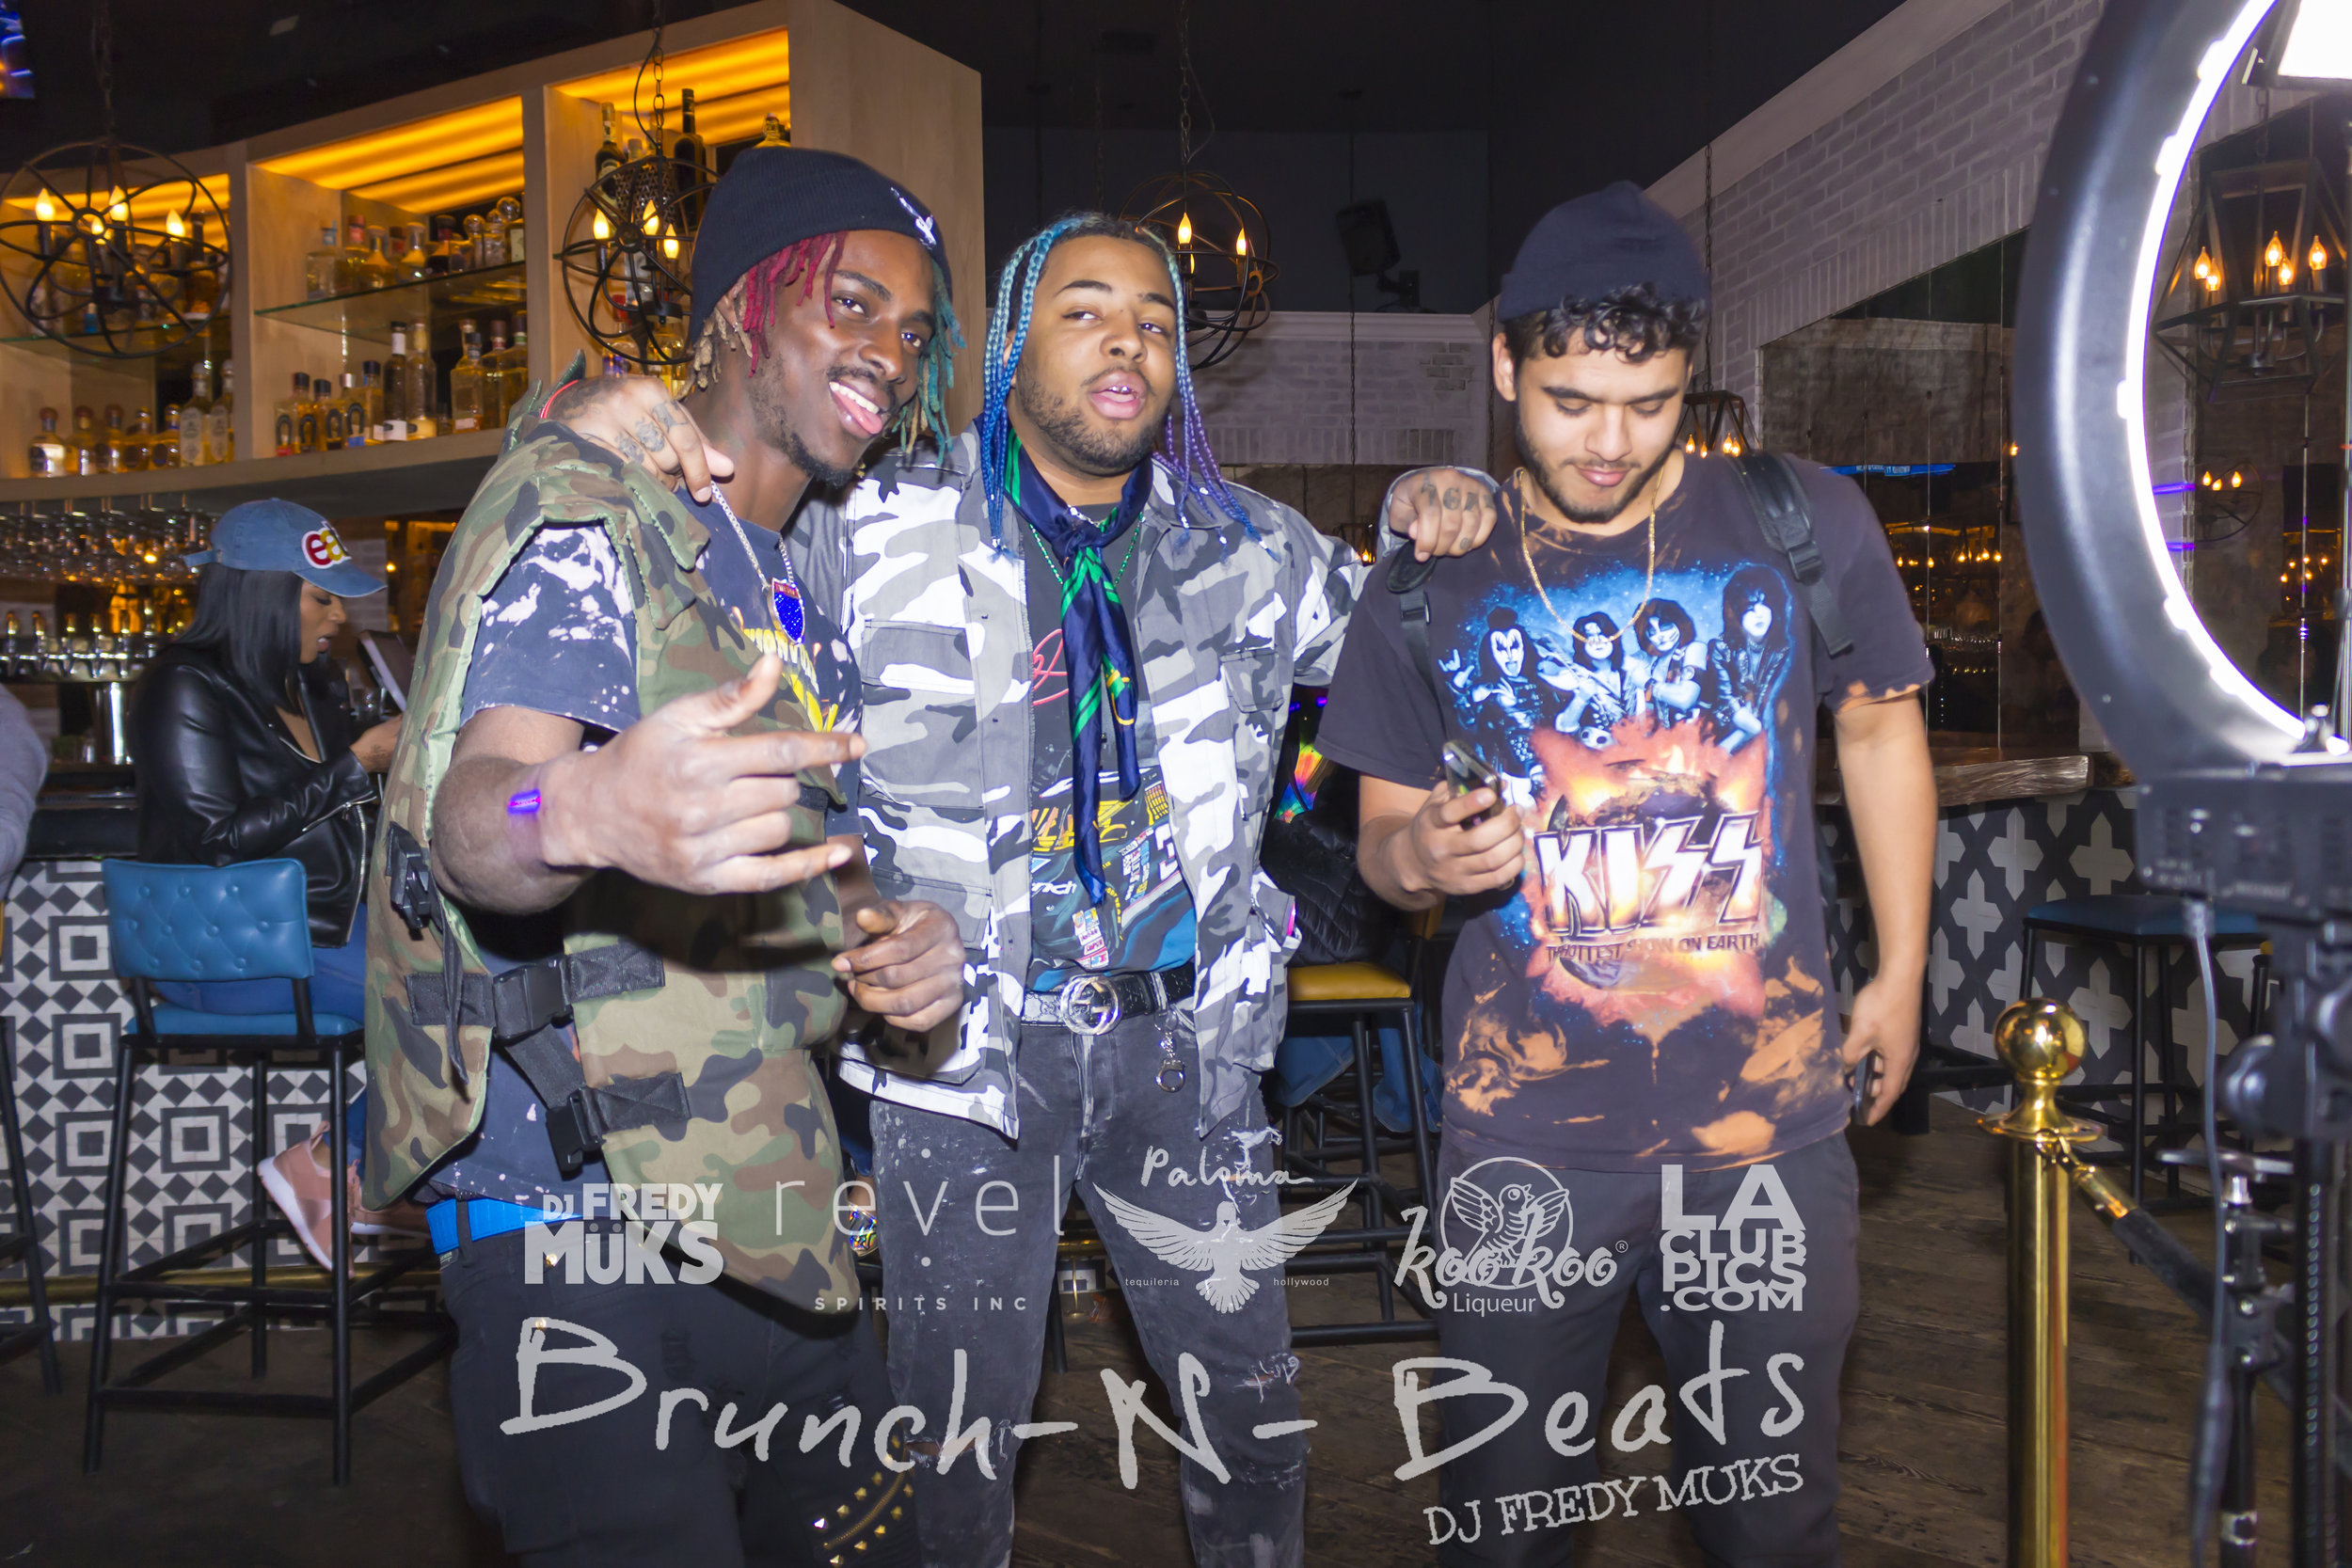 Brunch-N-Beats - Paloma Hollywood - 02-25-18_229.jpg